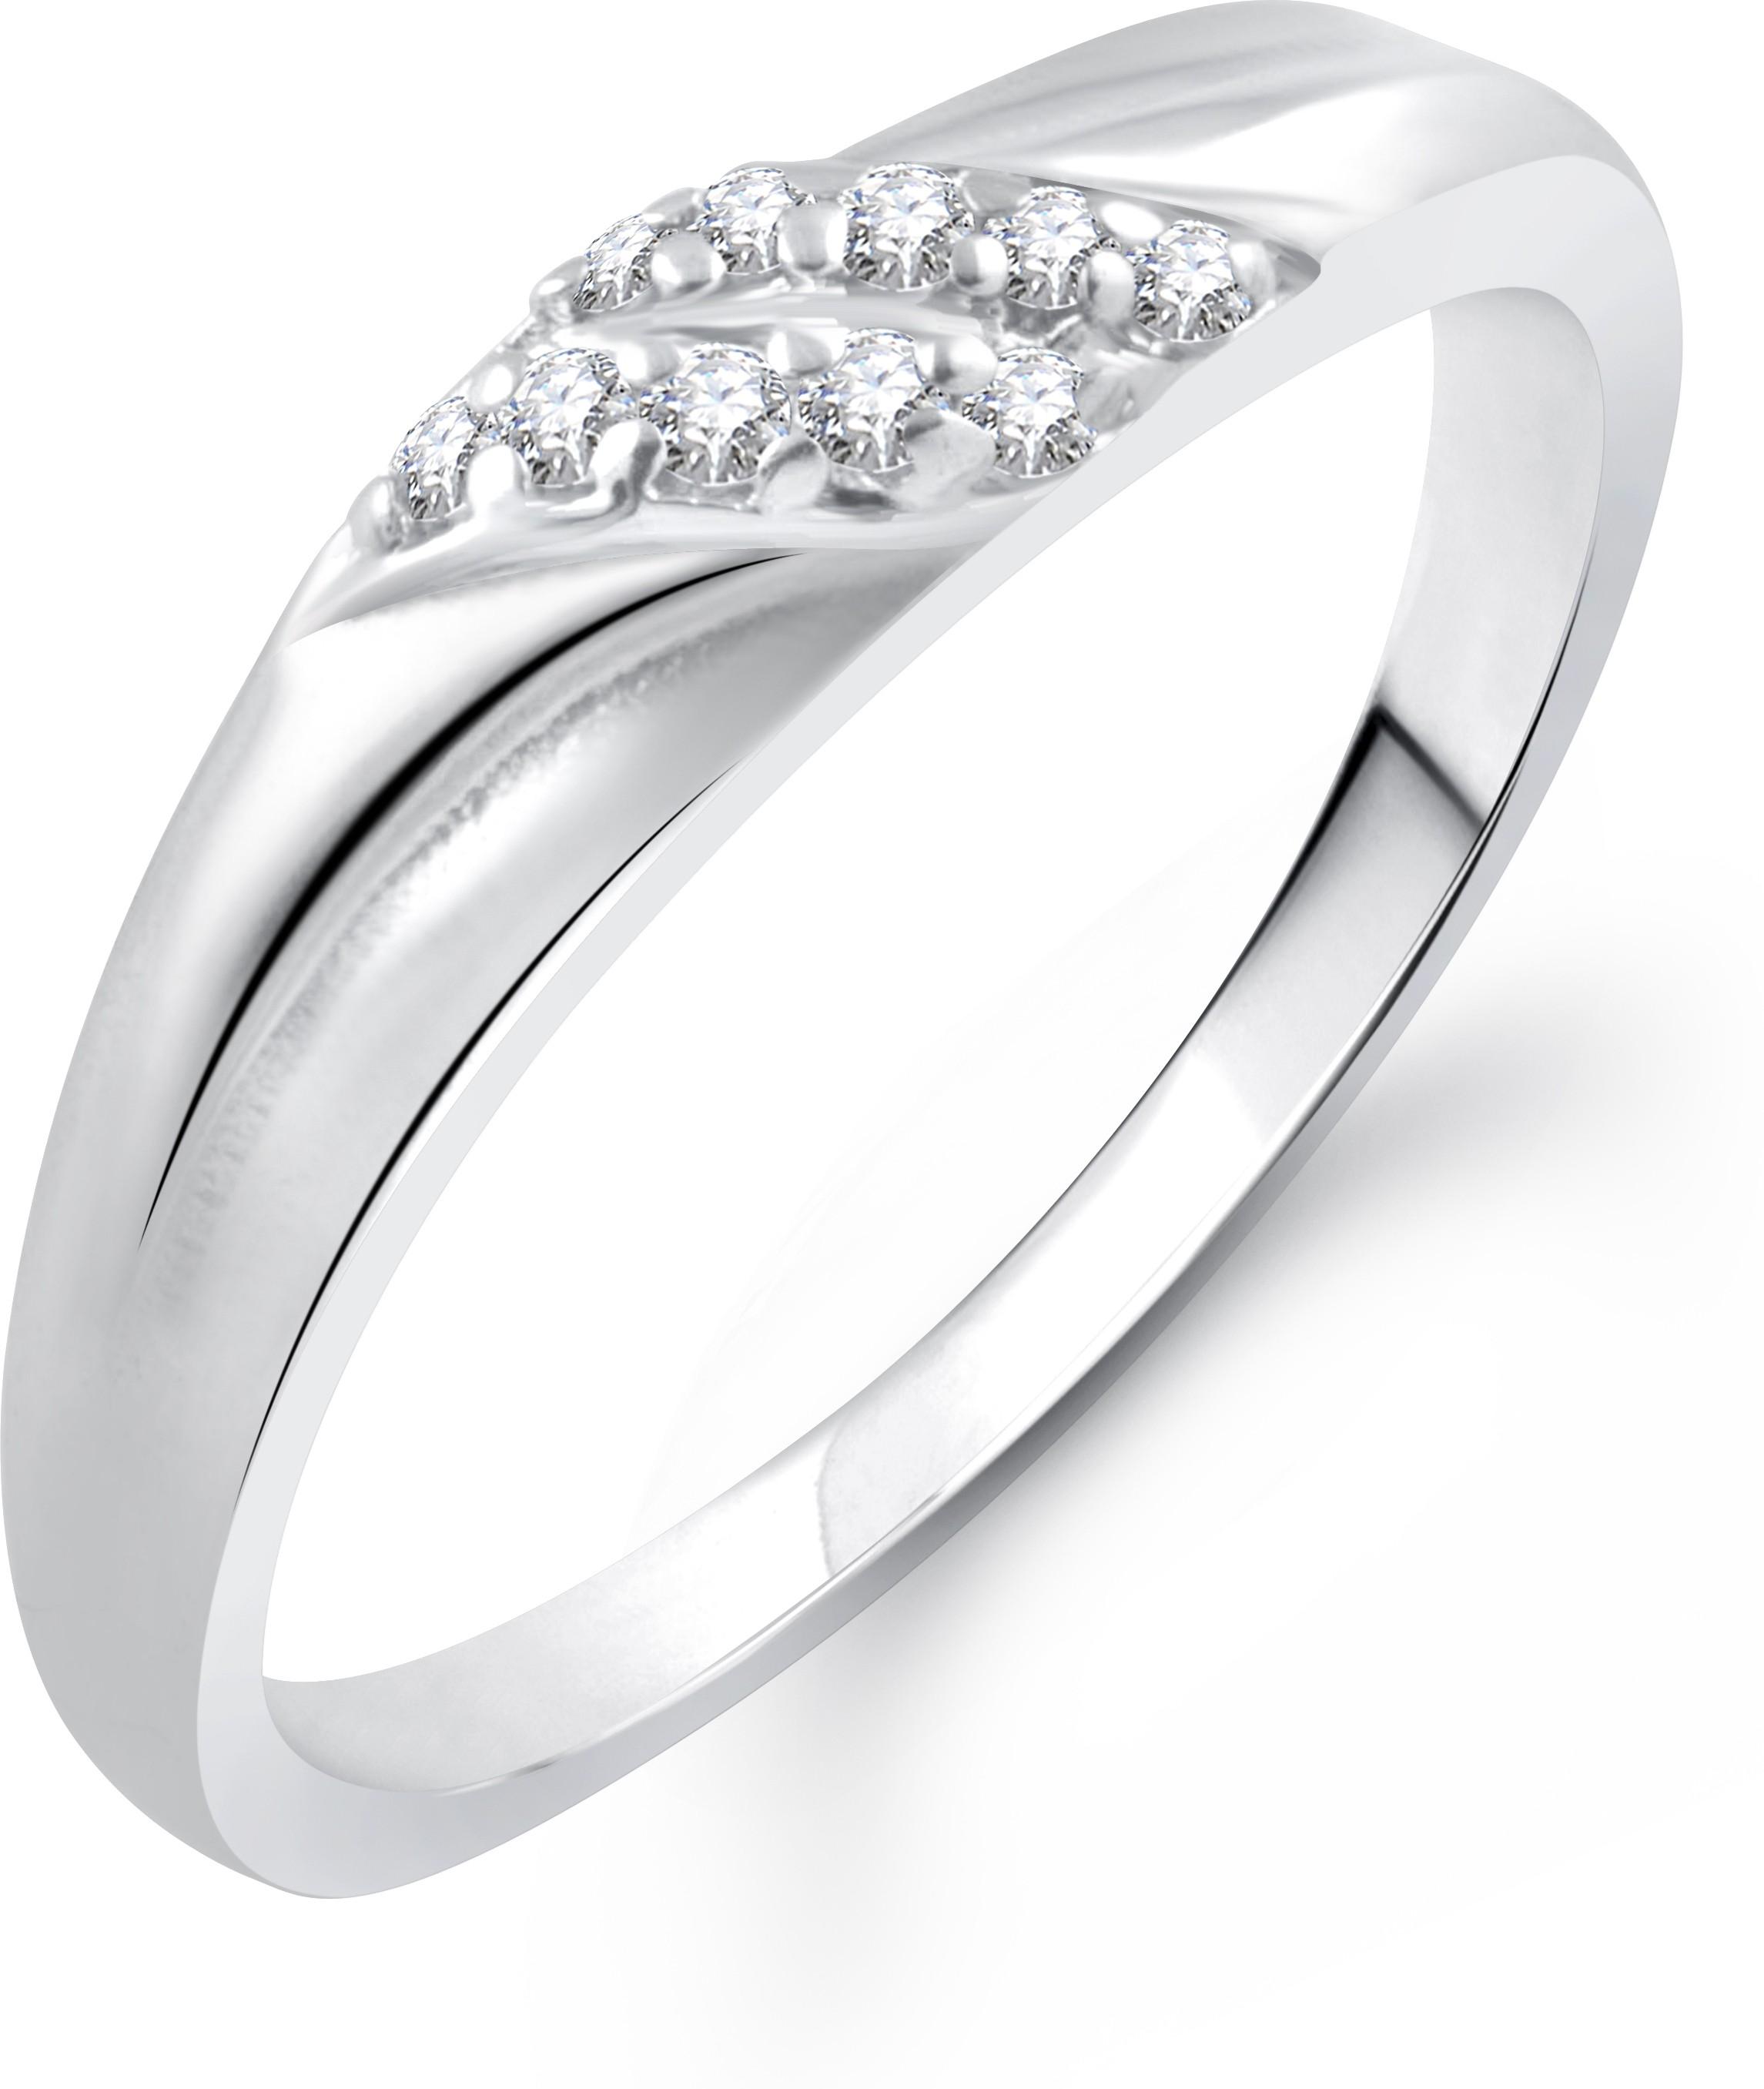 Deals - Delhi - Rings <br> VK Jewels, Sukkhi, Meenaz...<br> Category - jewellery<br> Business - Flipkart.com